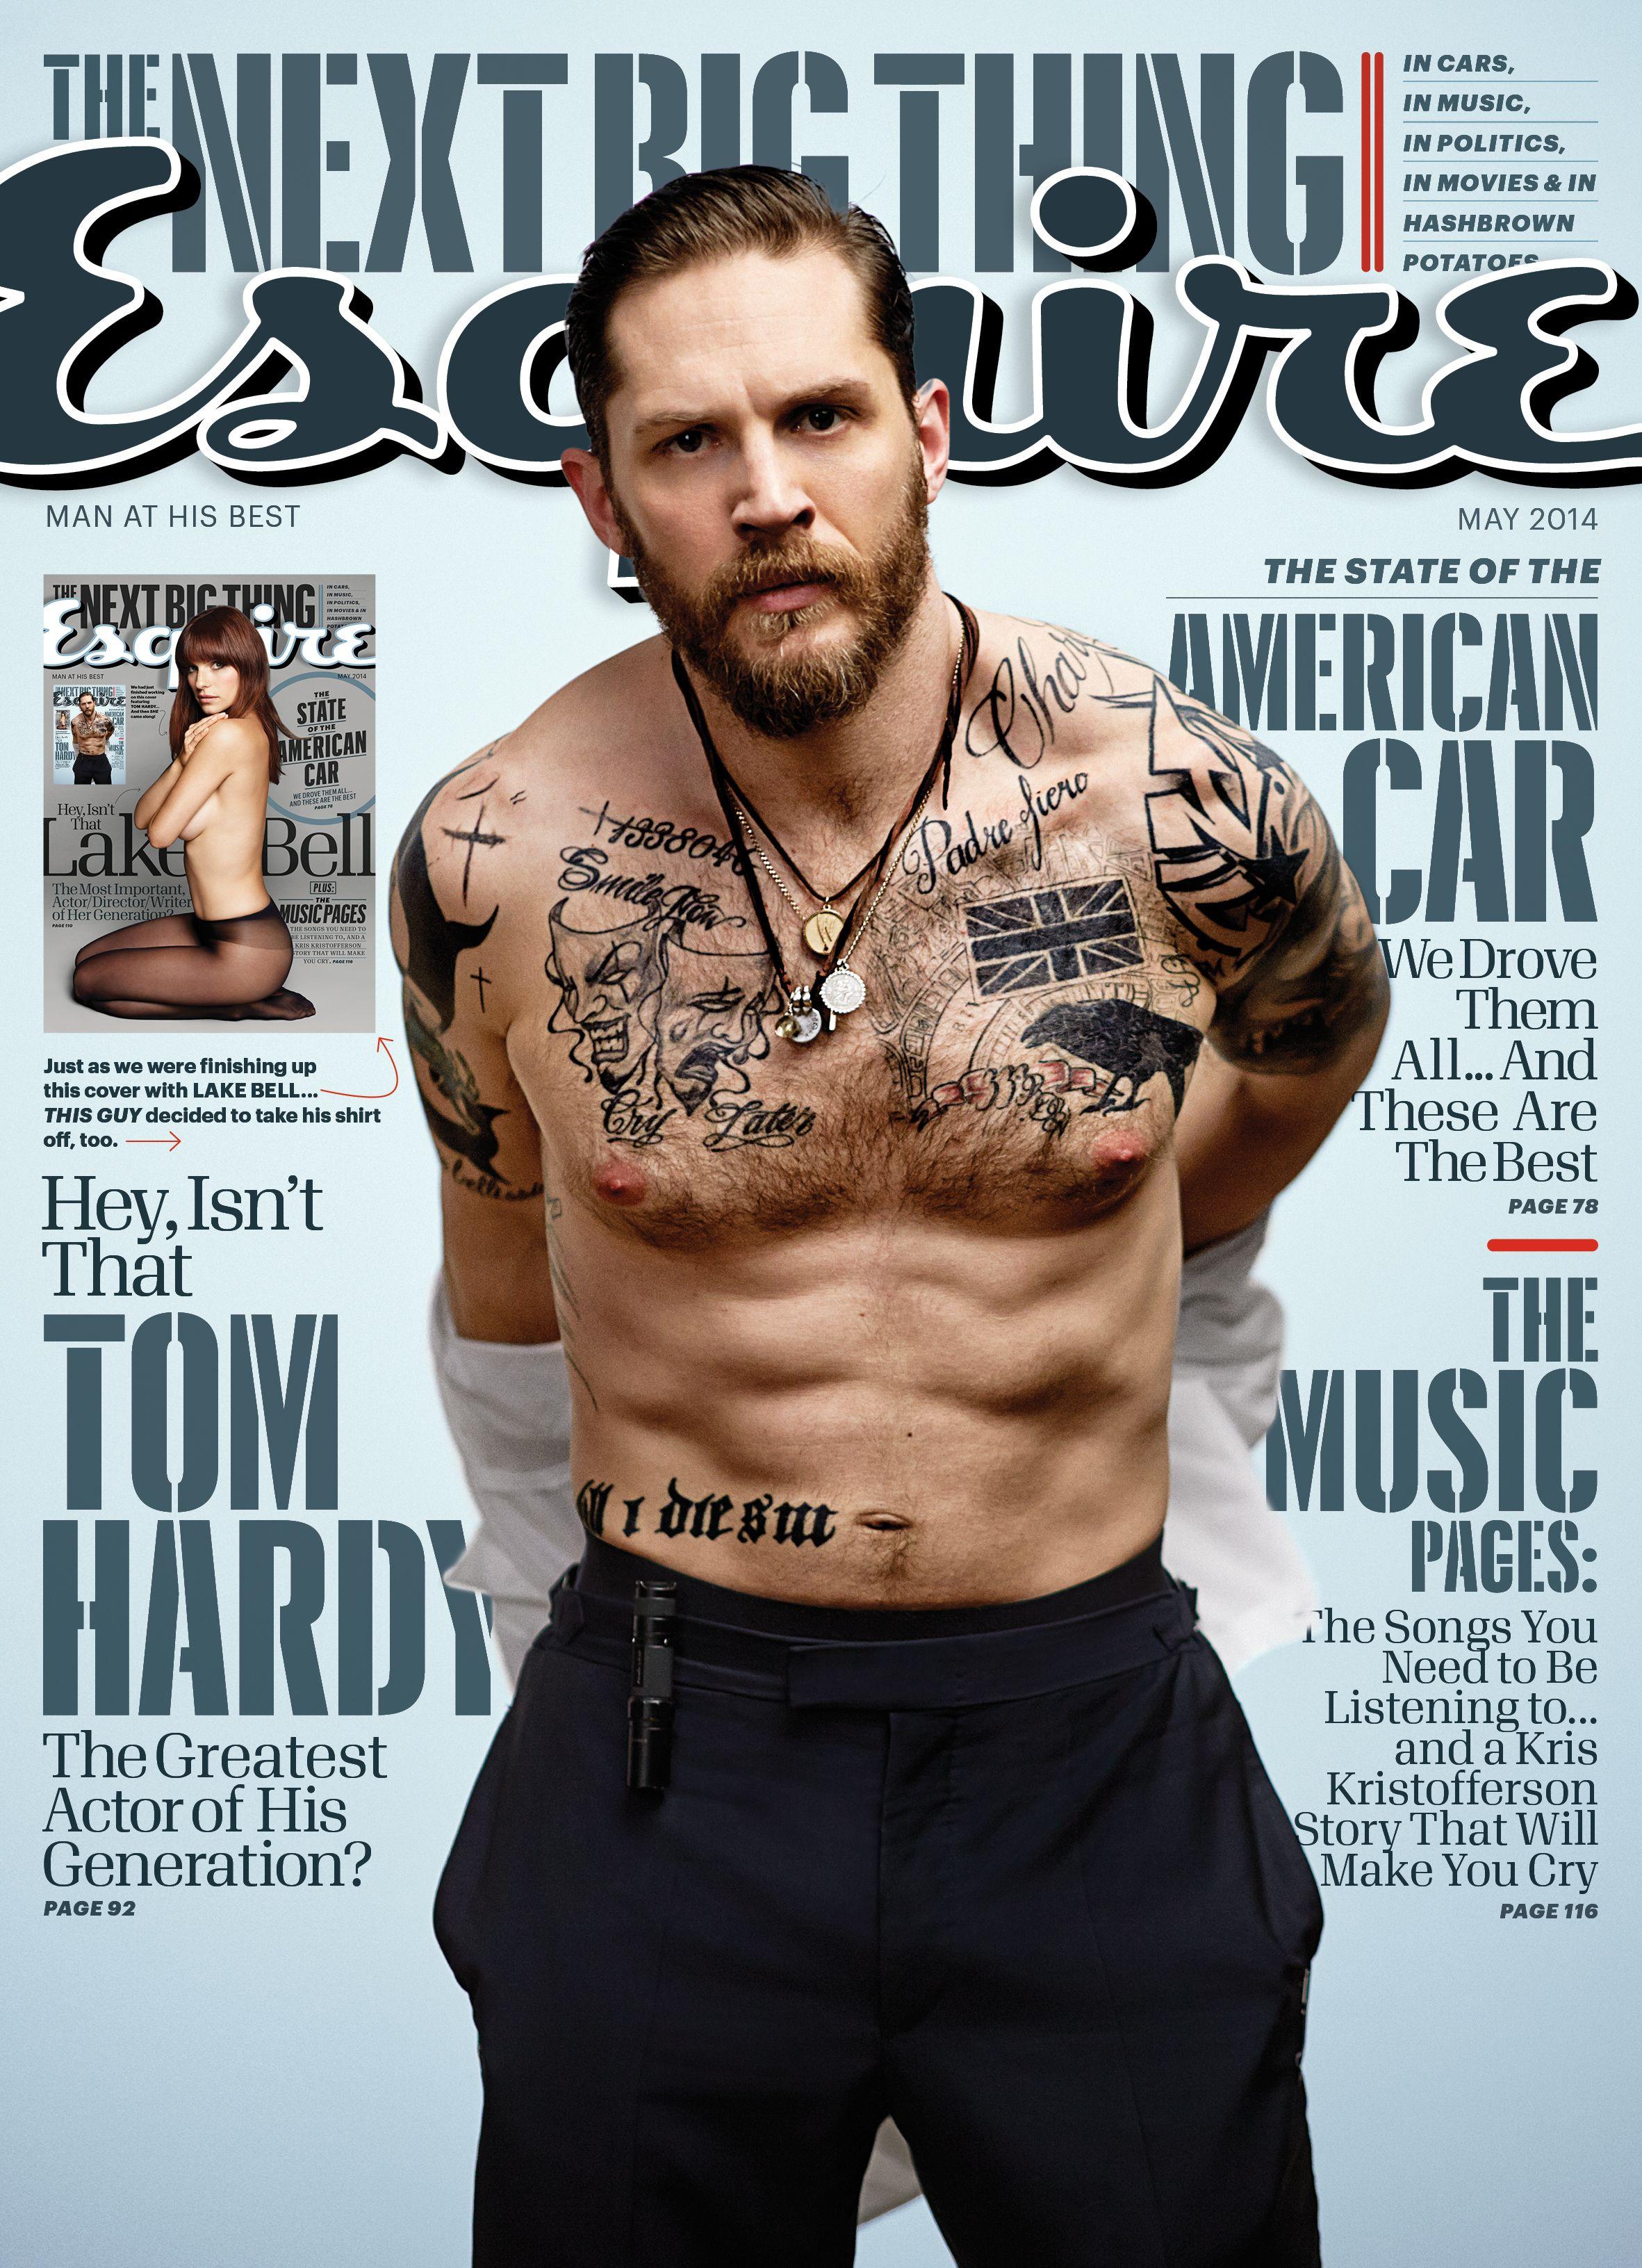 Tattooed dudes nailing